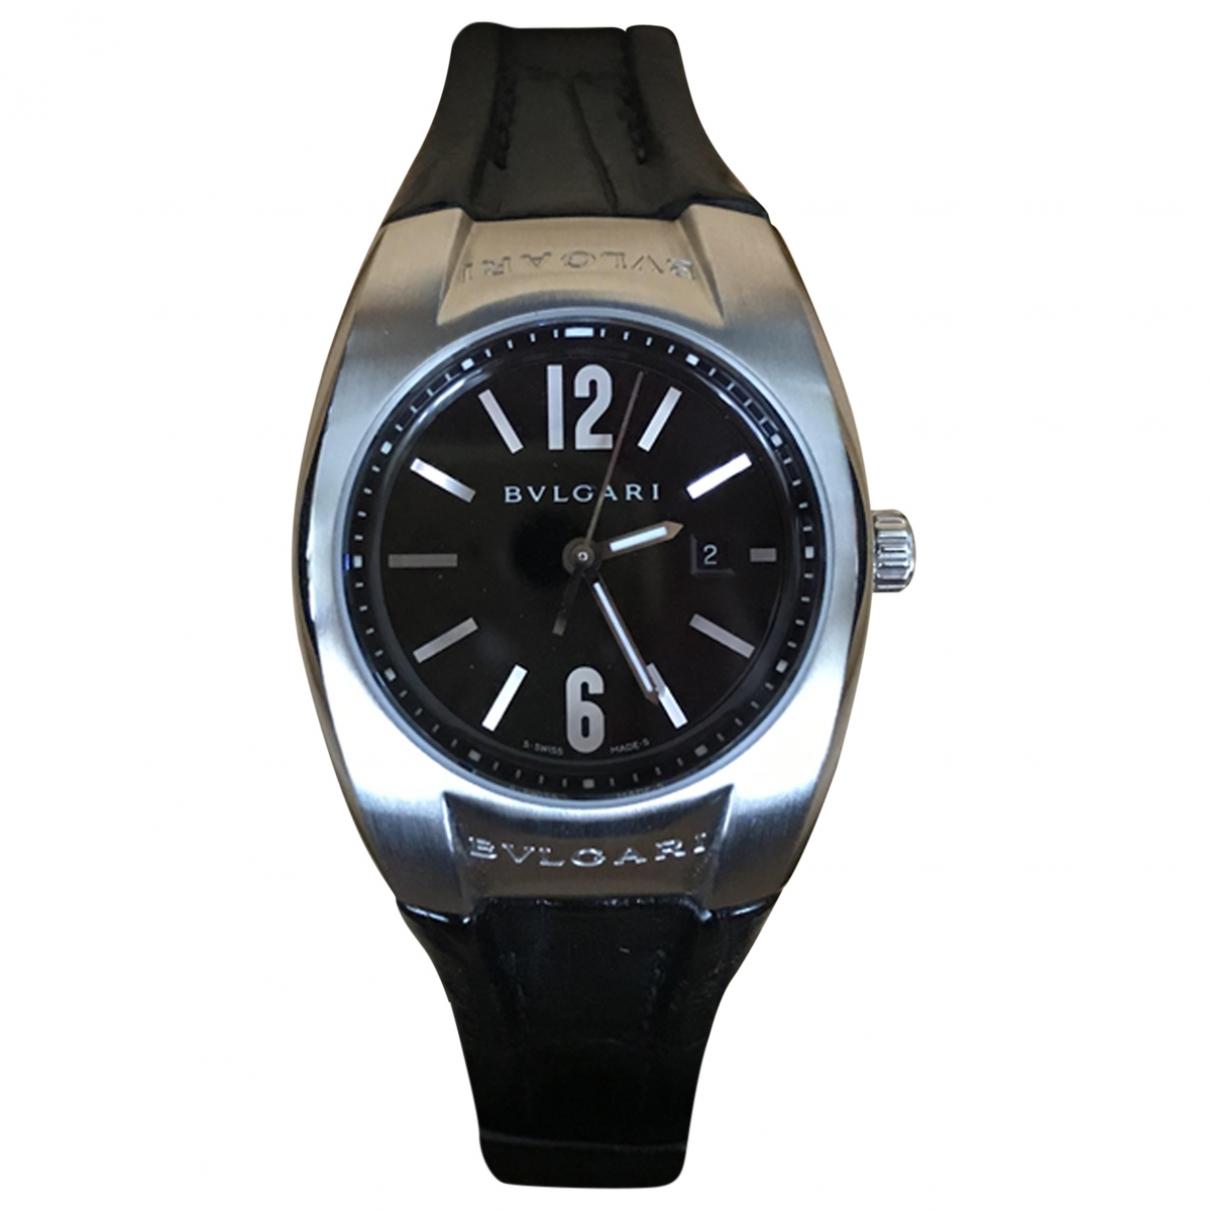 Bvlgari Ergon Uhr in  Silber Stahl